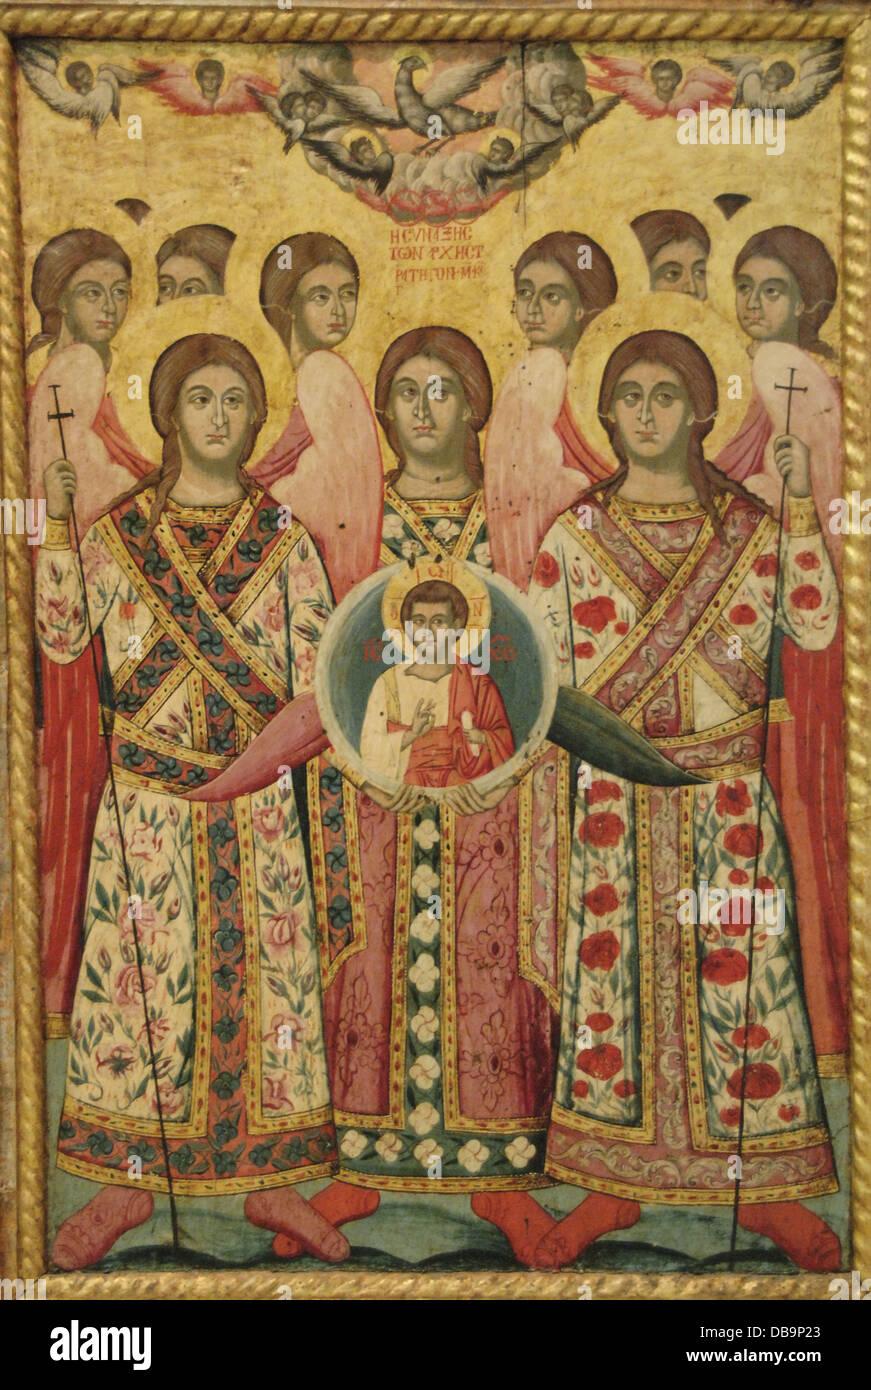 Saints. Icon. Anonymous work, 18th century. National Art Gallery. Tirana. Albania. - Stock Image